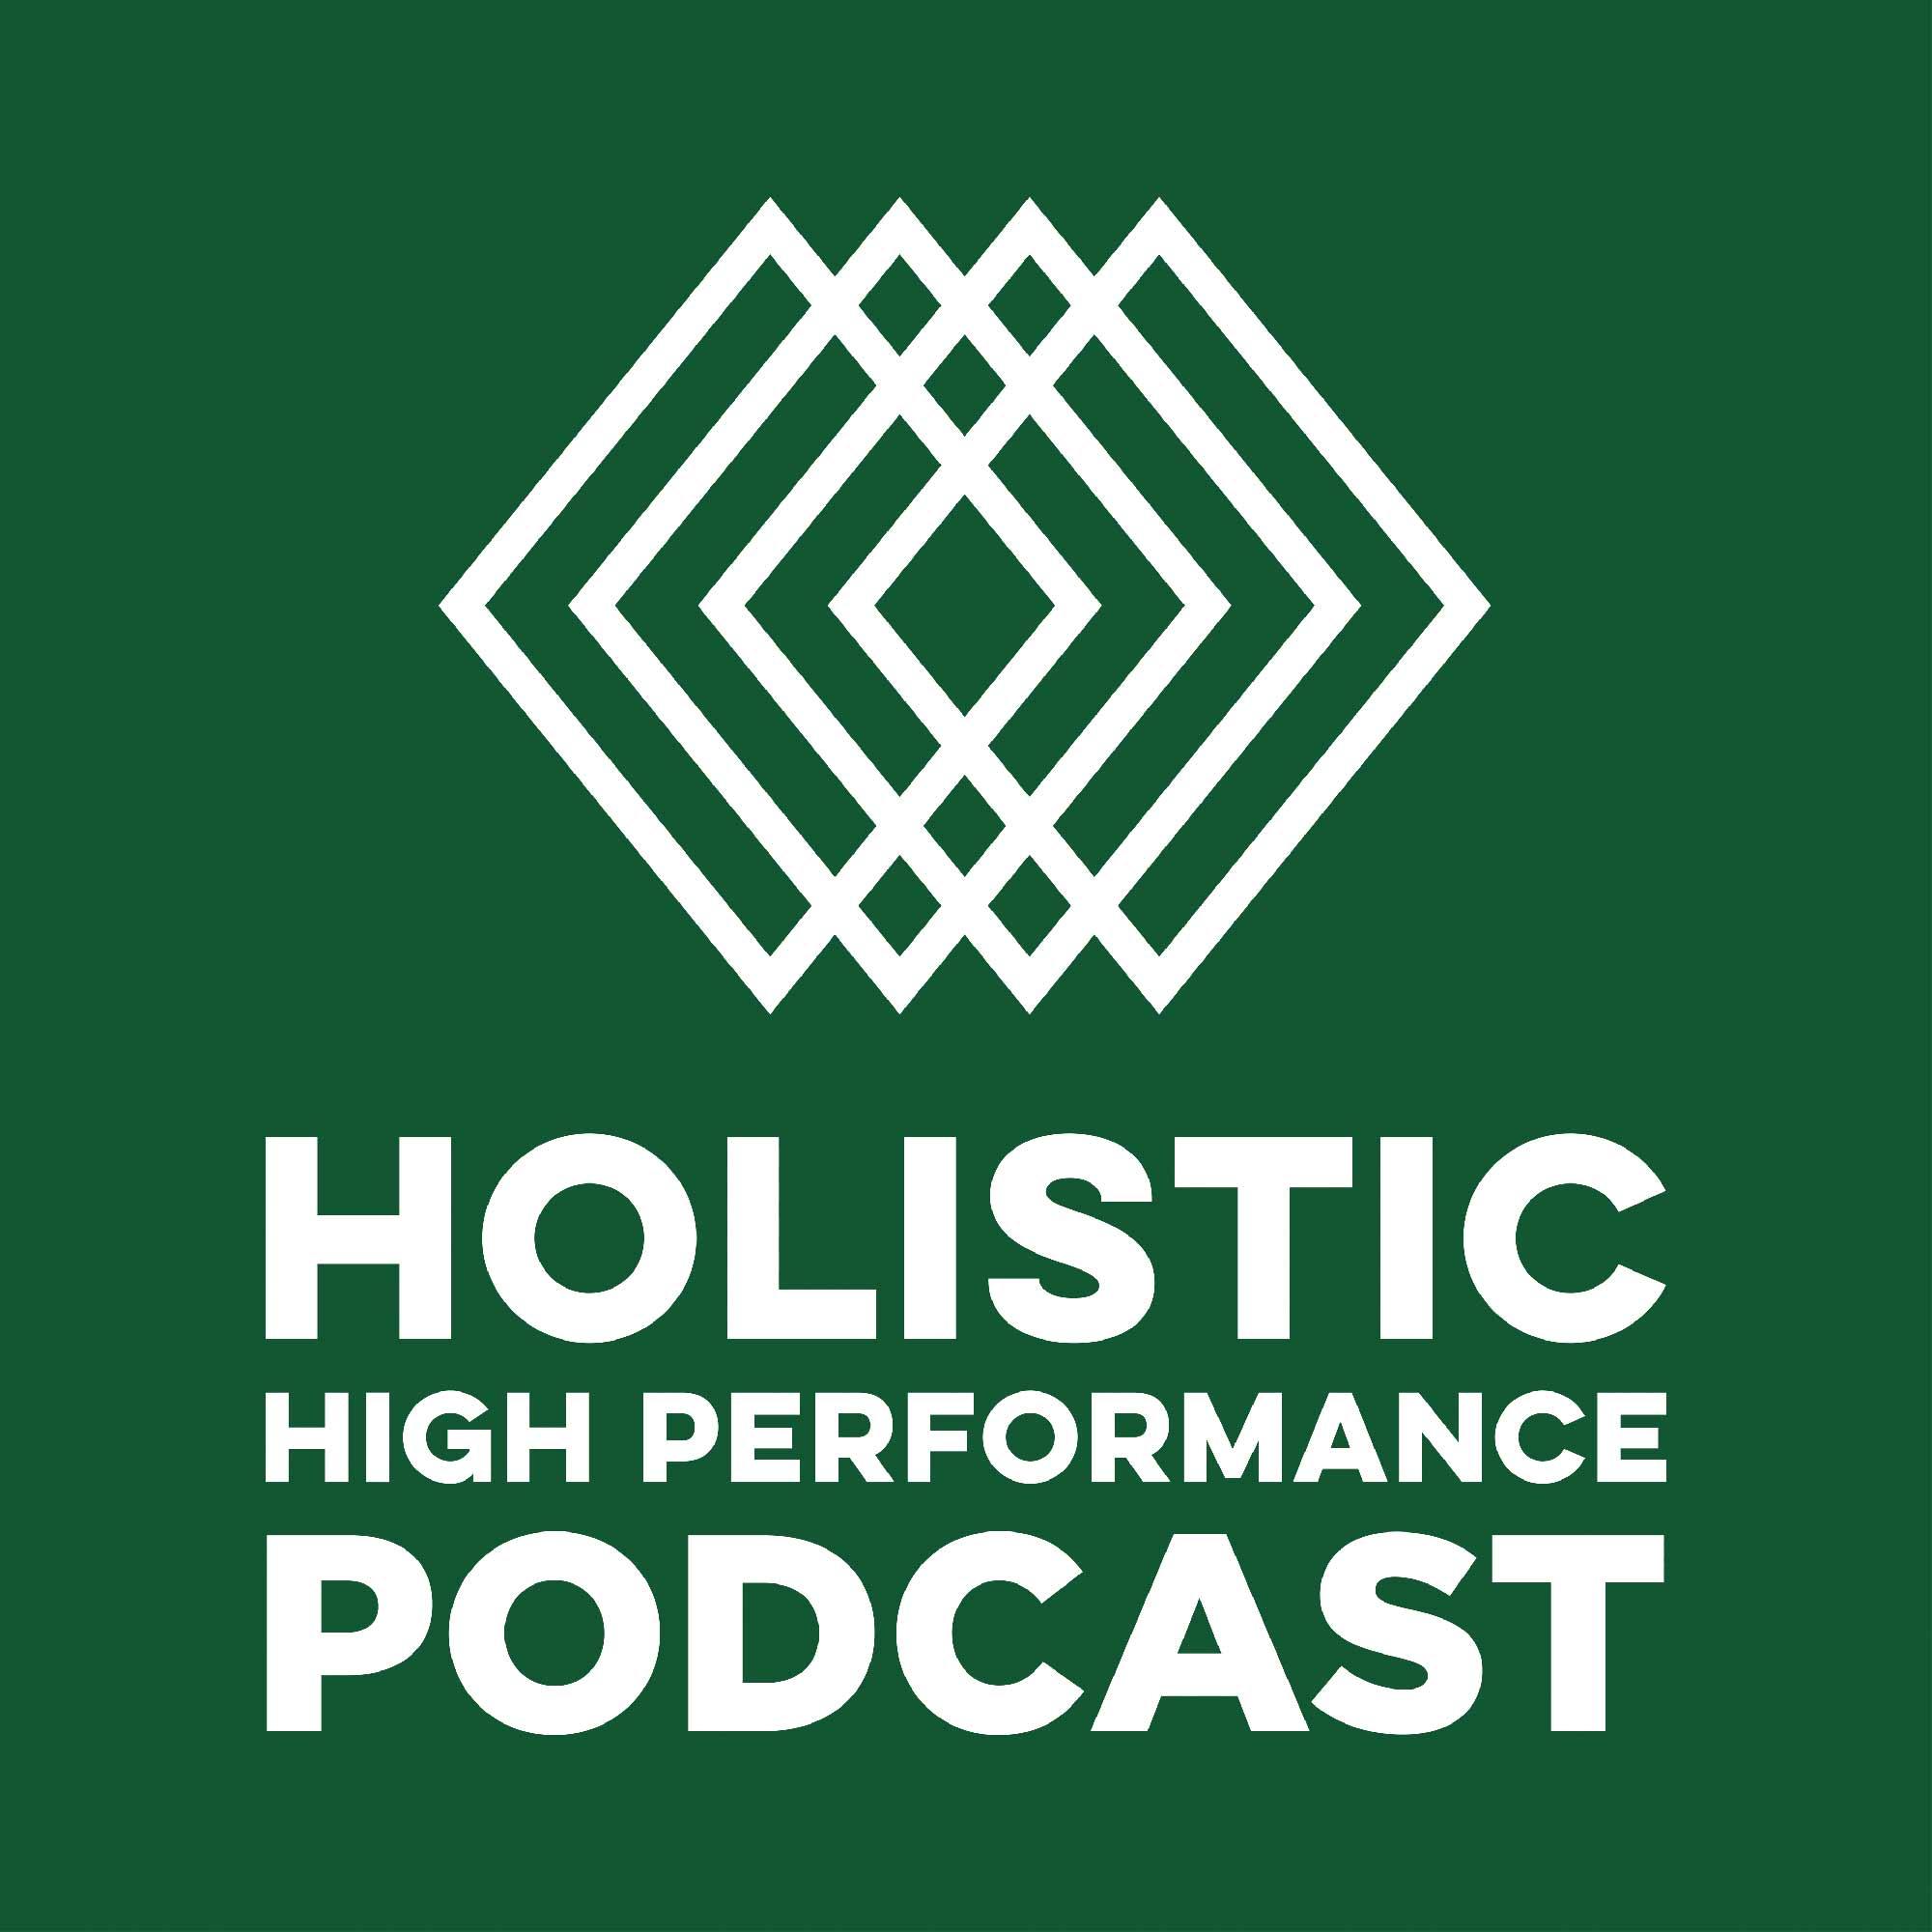 Holistic High Performance Podcast show art